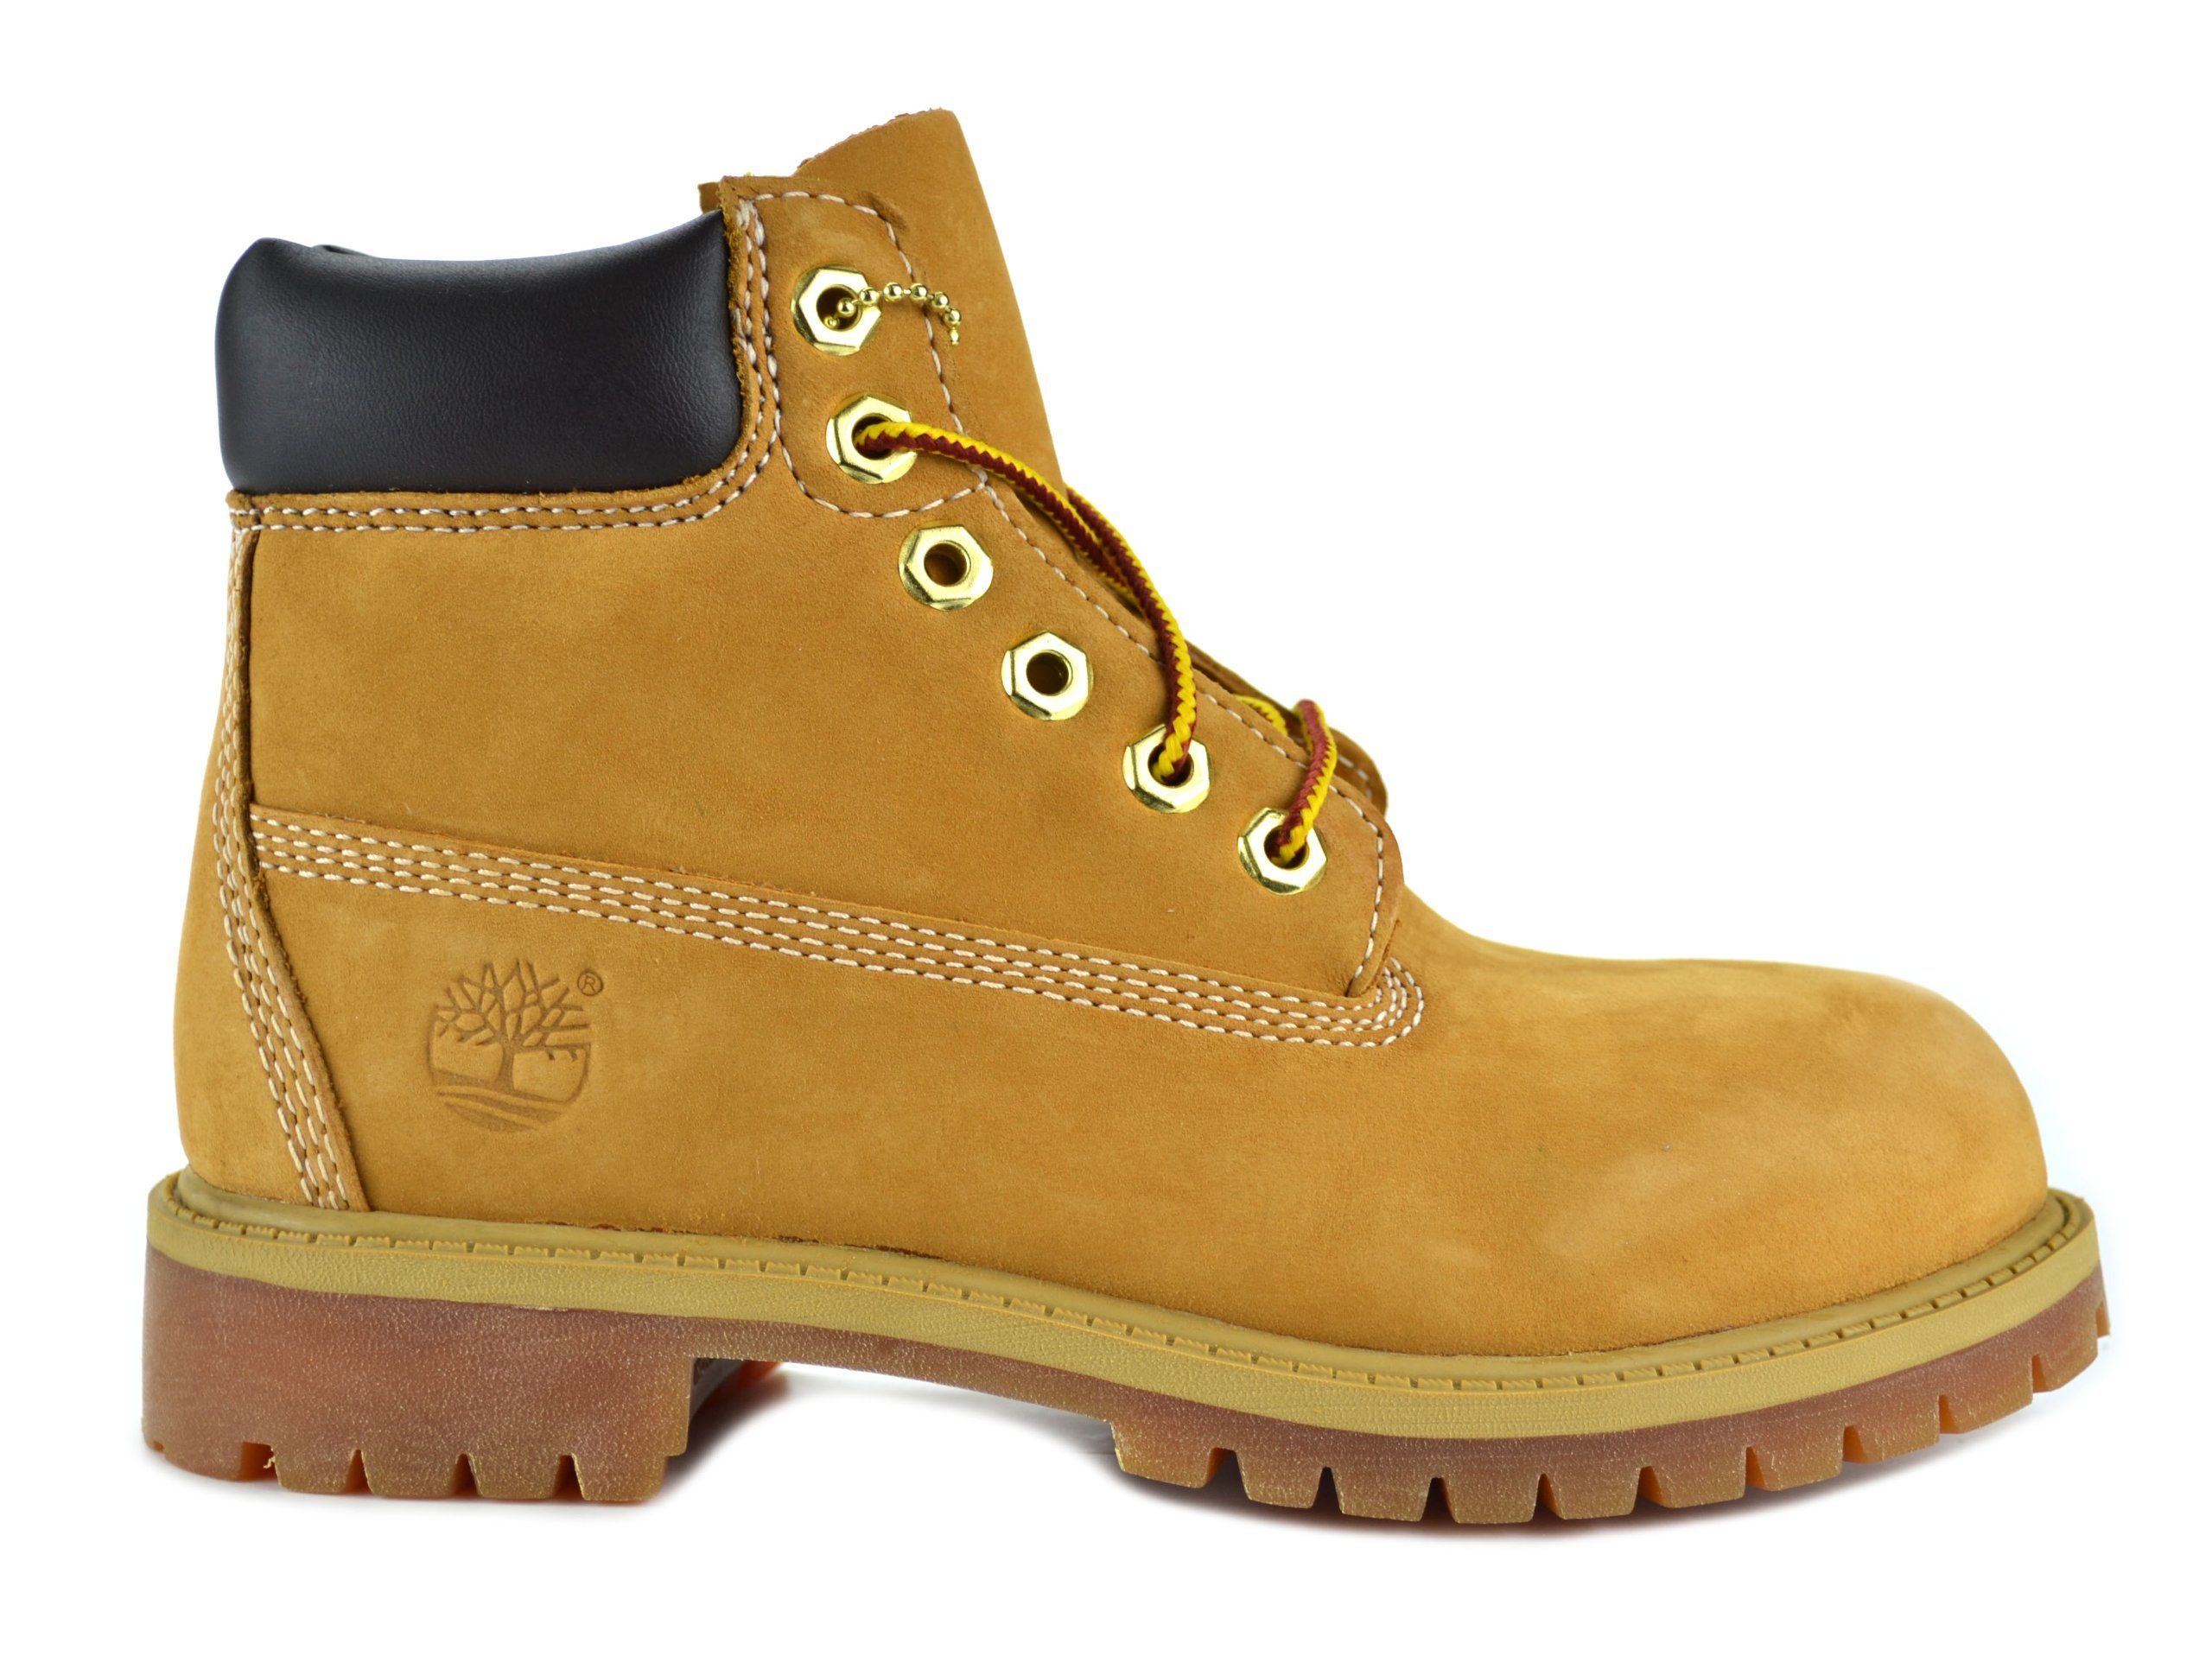 Timberland Kids Womens Susan G Komen 6 Premium Waterproof Boot Big Kid